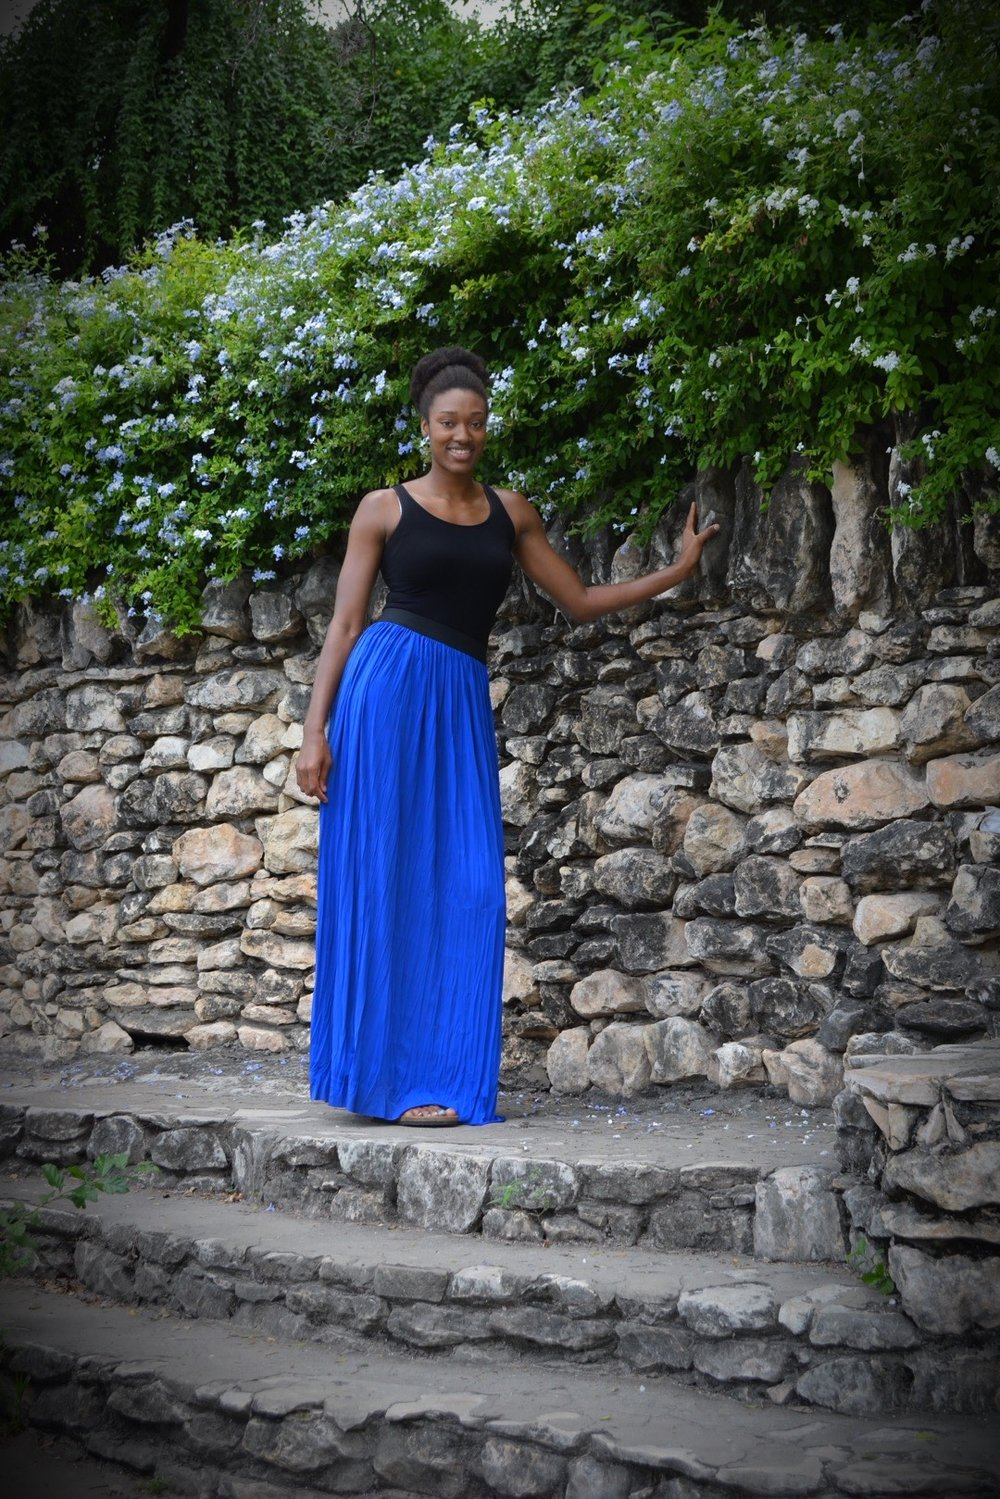 Talltique black tank top and blue crinkle tall maxi skirt.